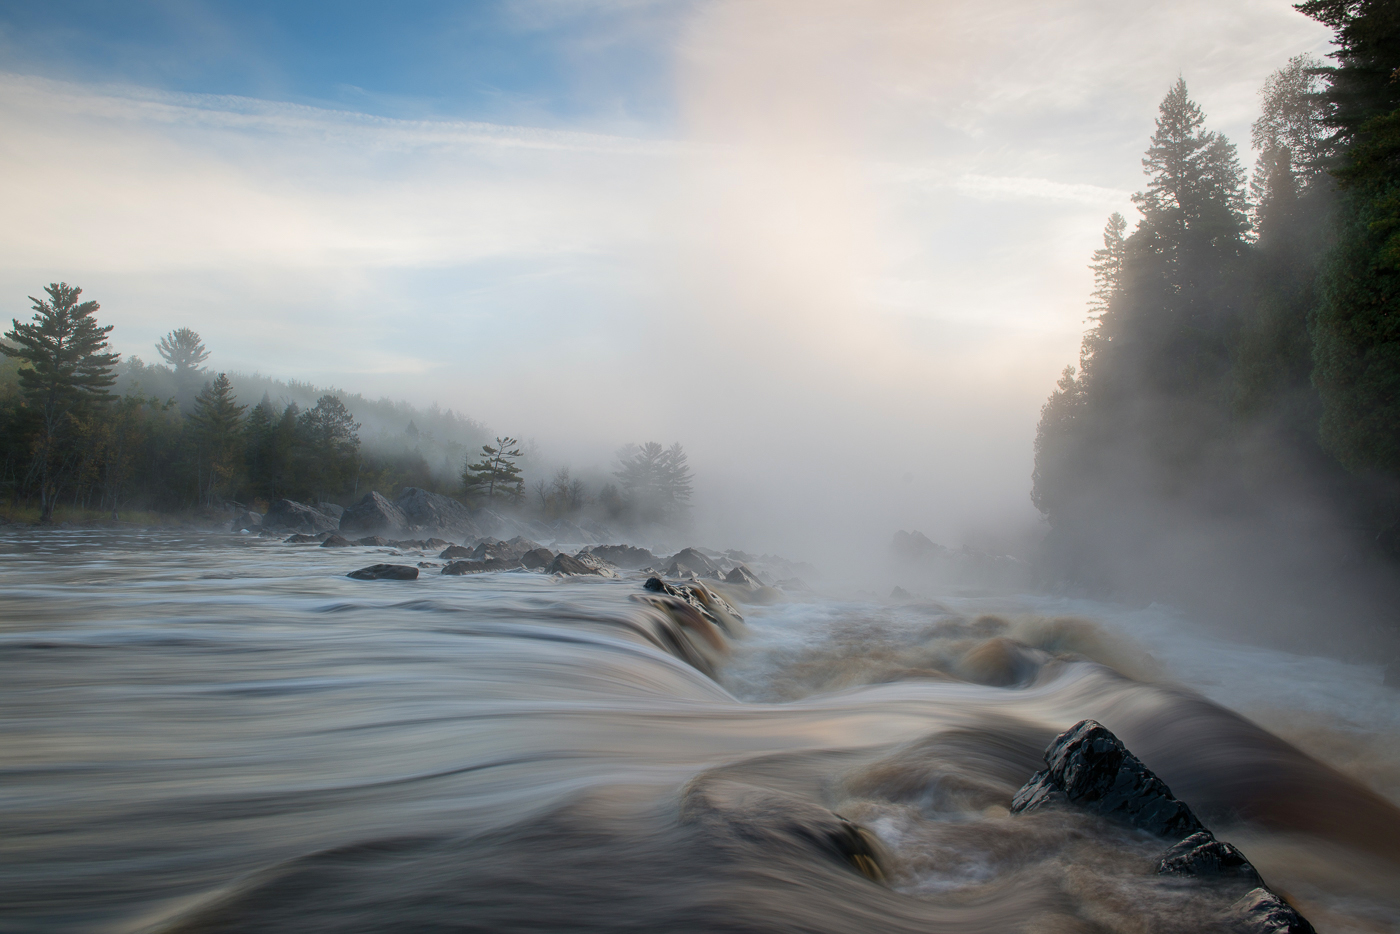 Morning fog on the St. Louis River, J. Cooke State Park, Minnesota